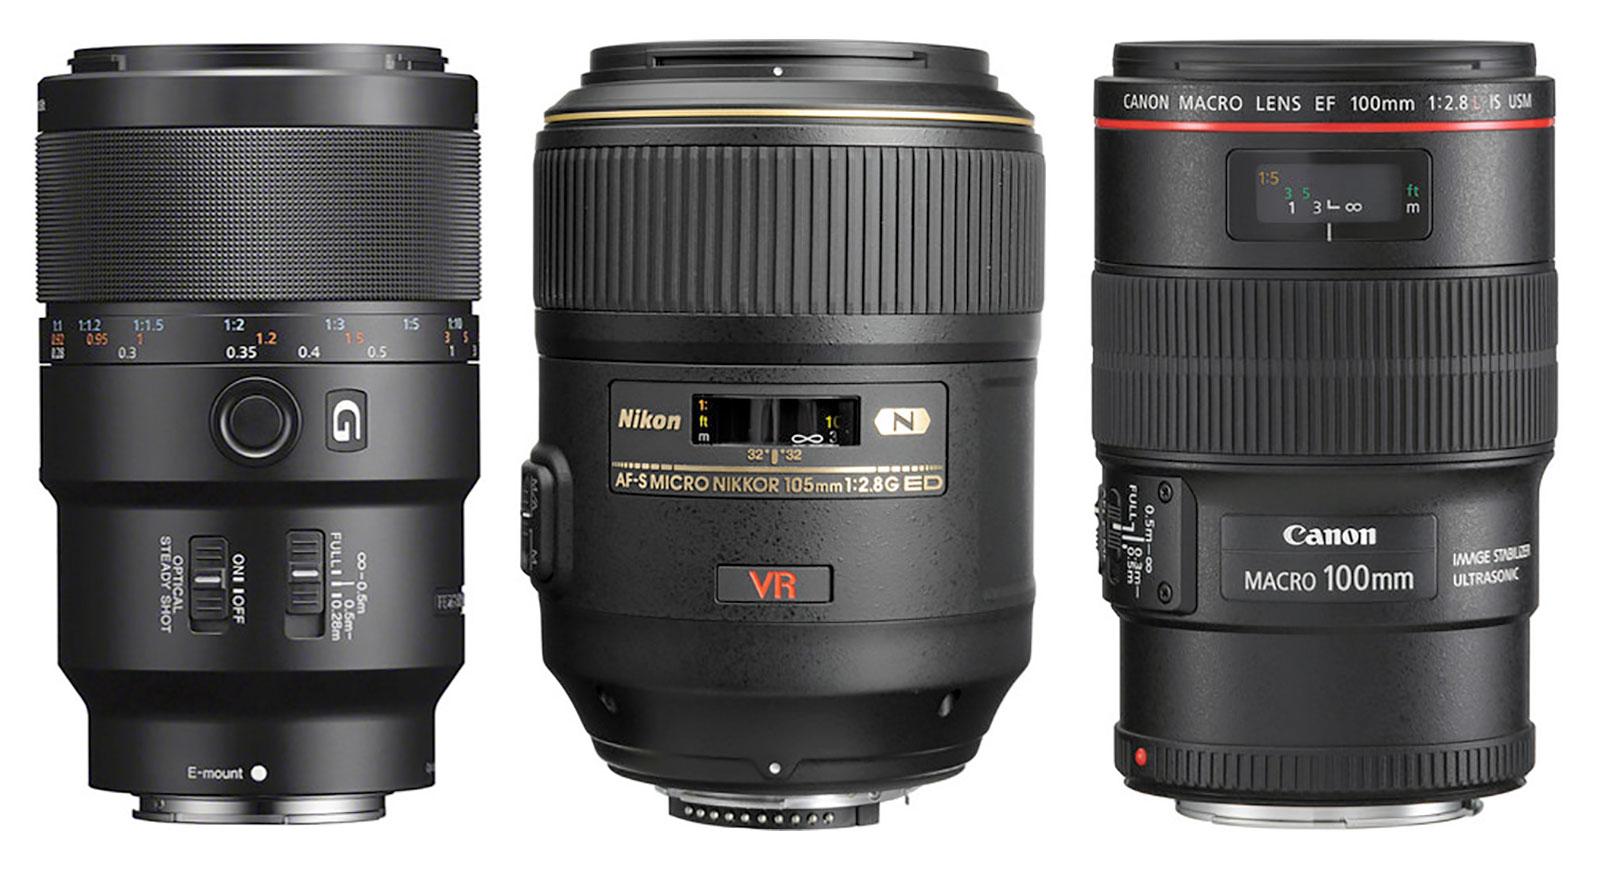 90mm-100mm Macro Lenses